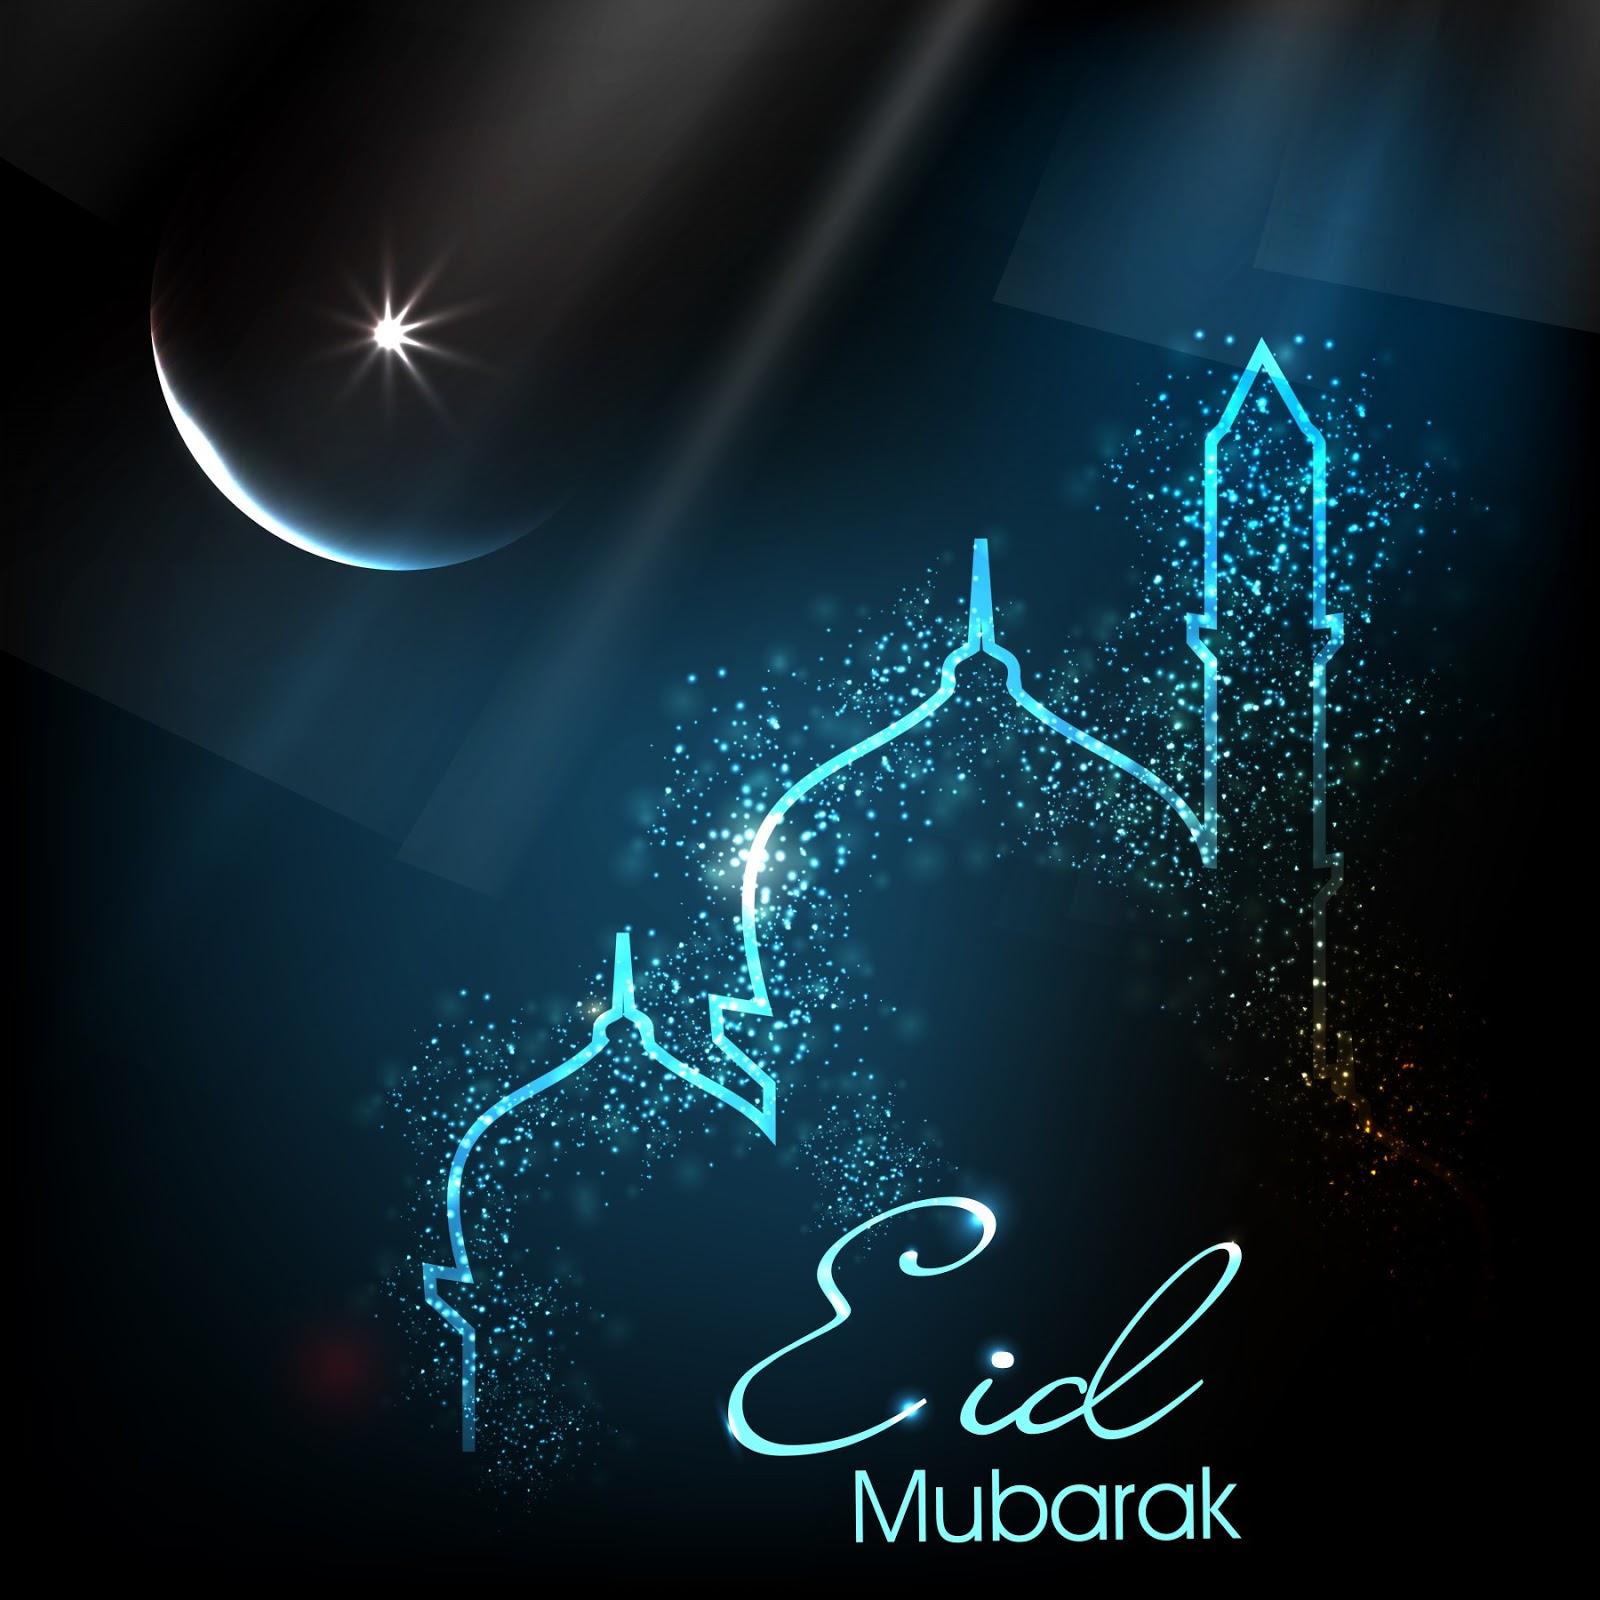 Happy Eid Mubarak 2016 Photo images Wishes Cards Sms And ...